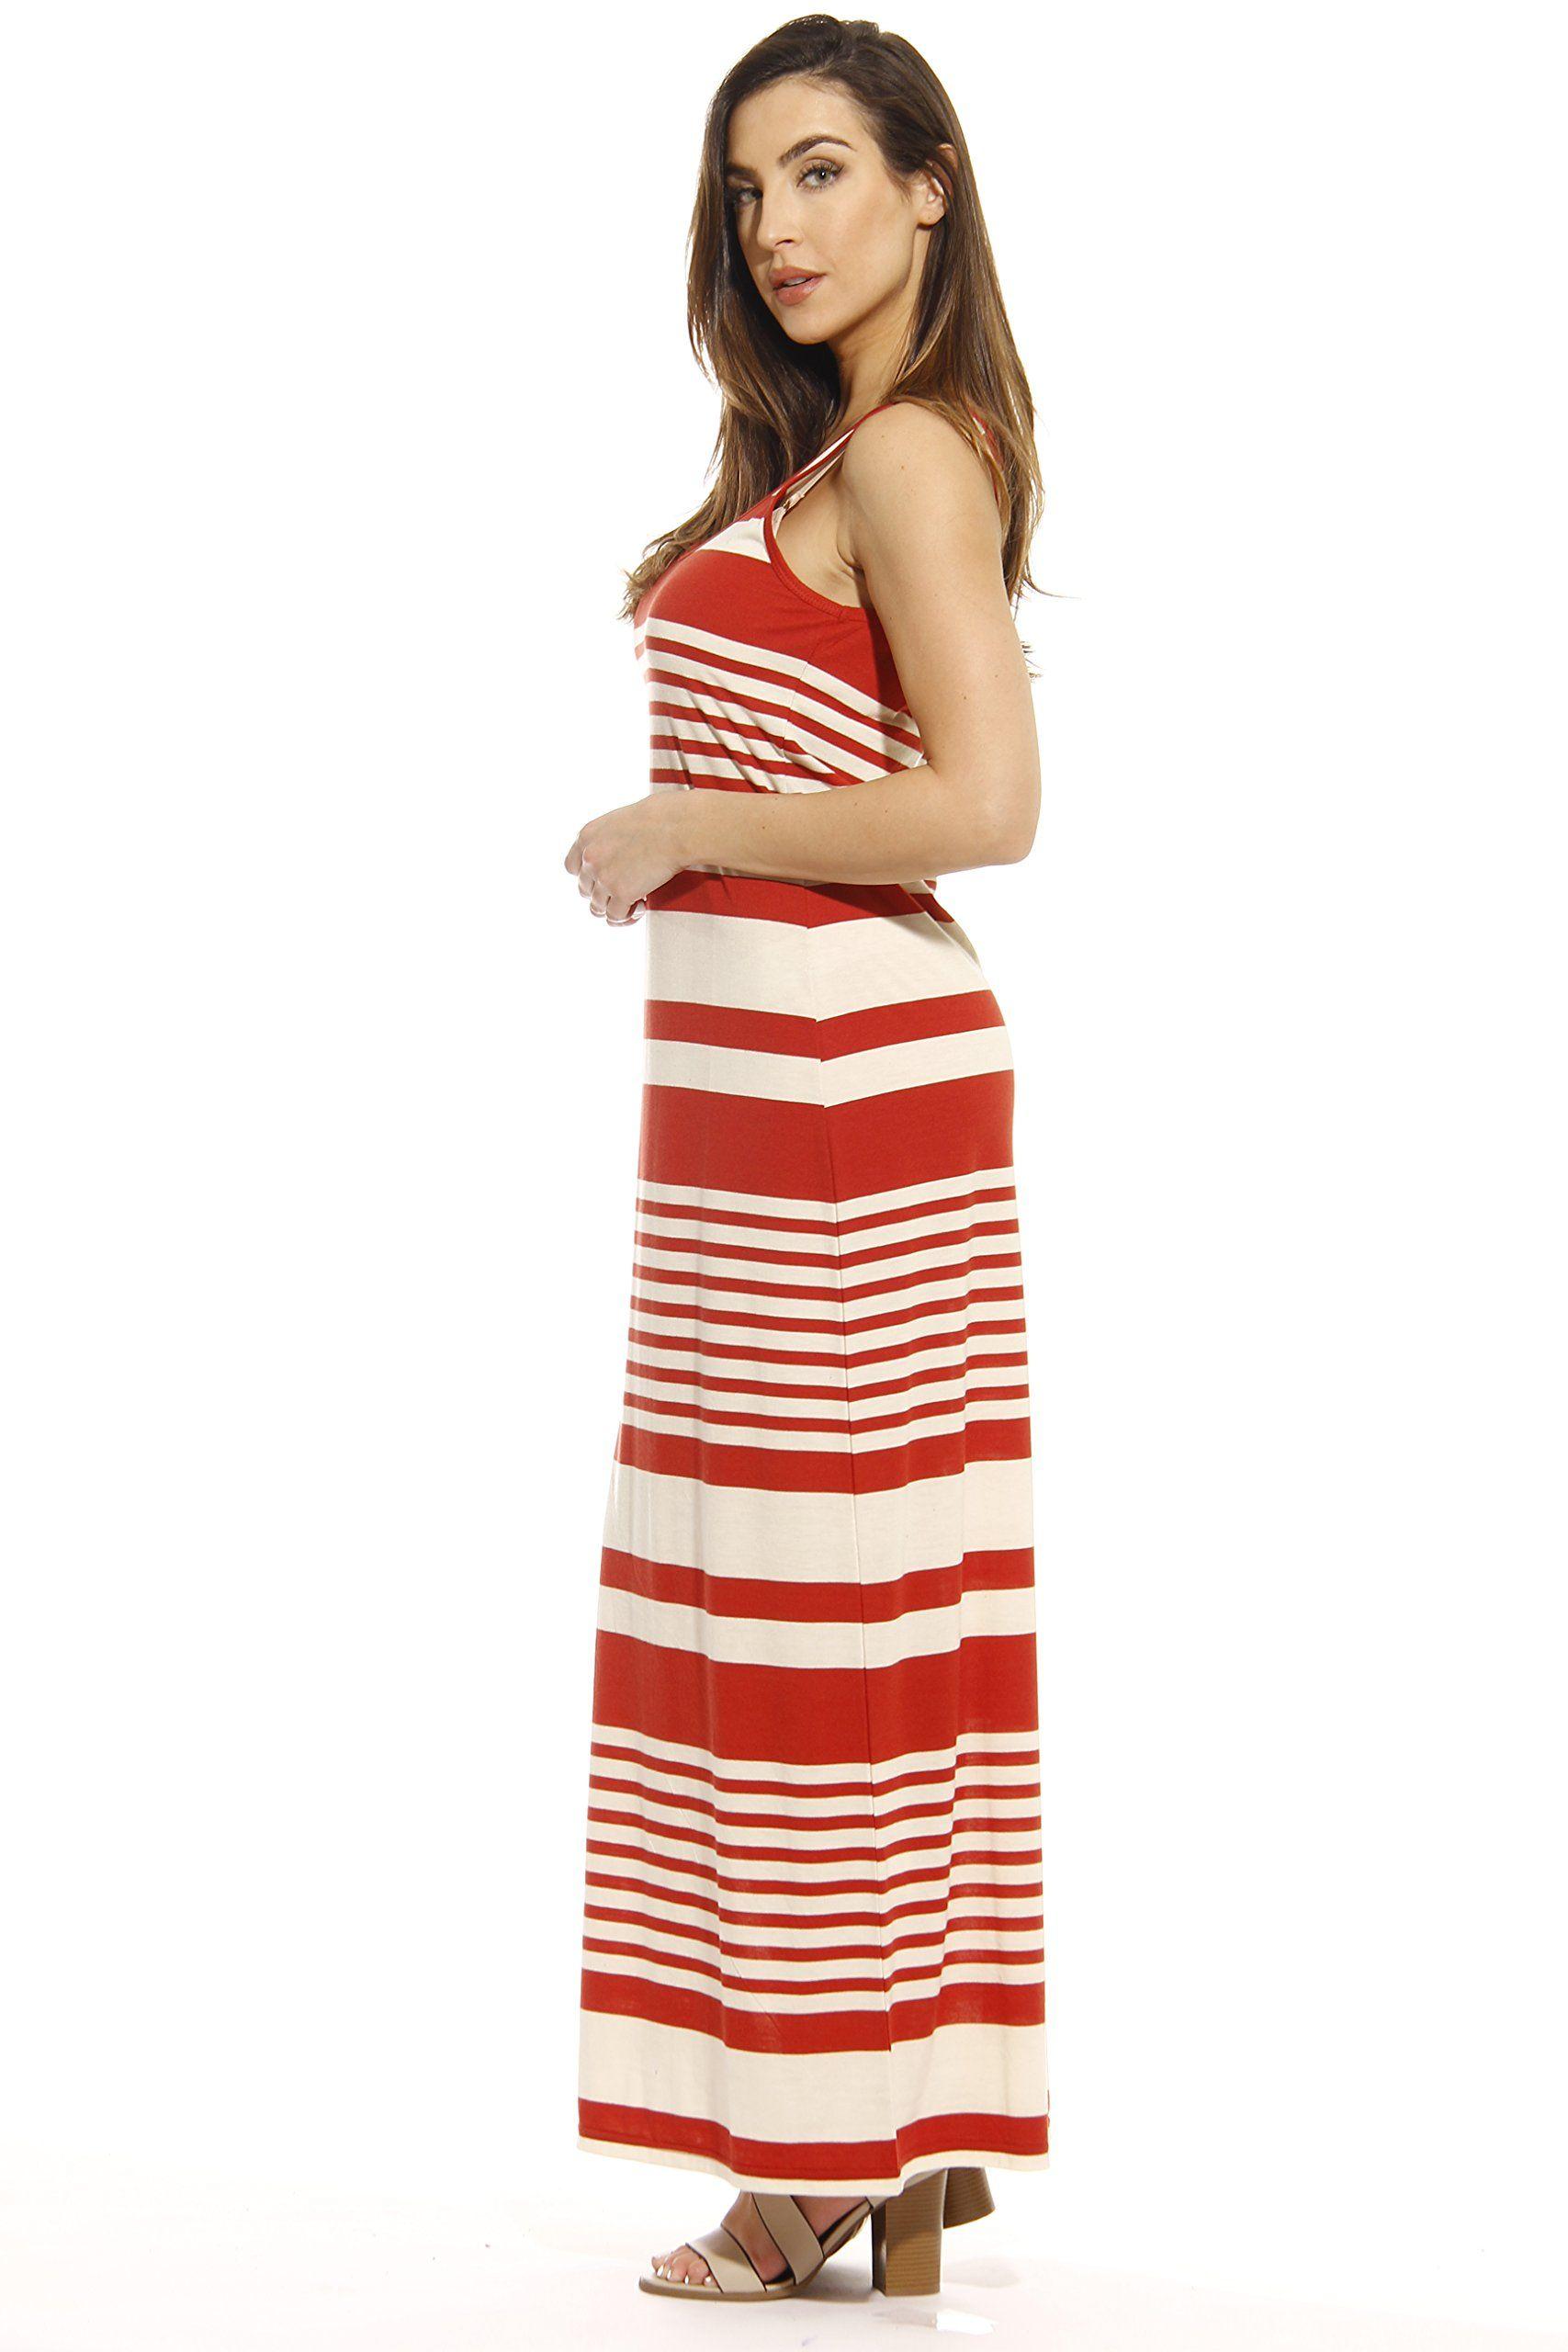 Just Love 3007 138 Redo Xl Just Love Summer Dresses Maxi Dress Rust Cream Medium Walmart Com Rust Dress Summer Maxi Dress Summer Dresses [ 2560 x 1707 Pixel ]